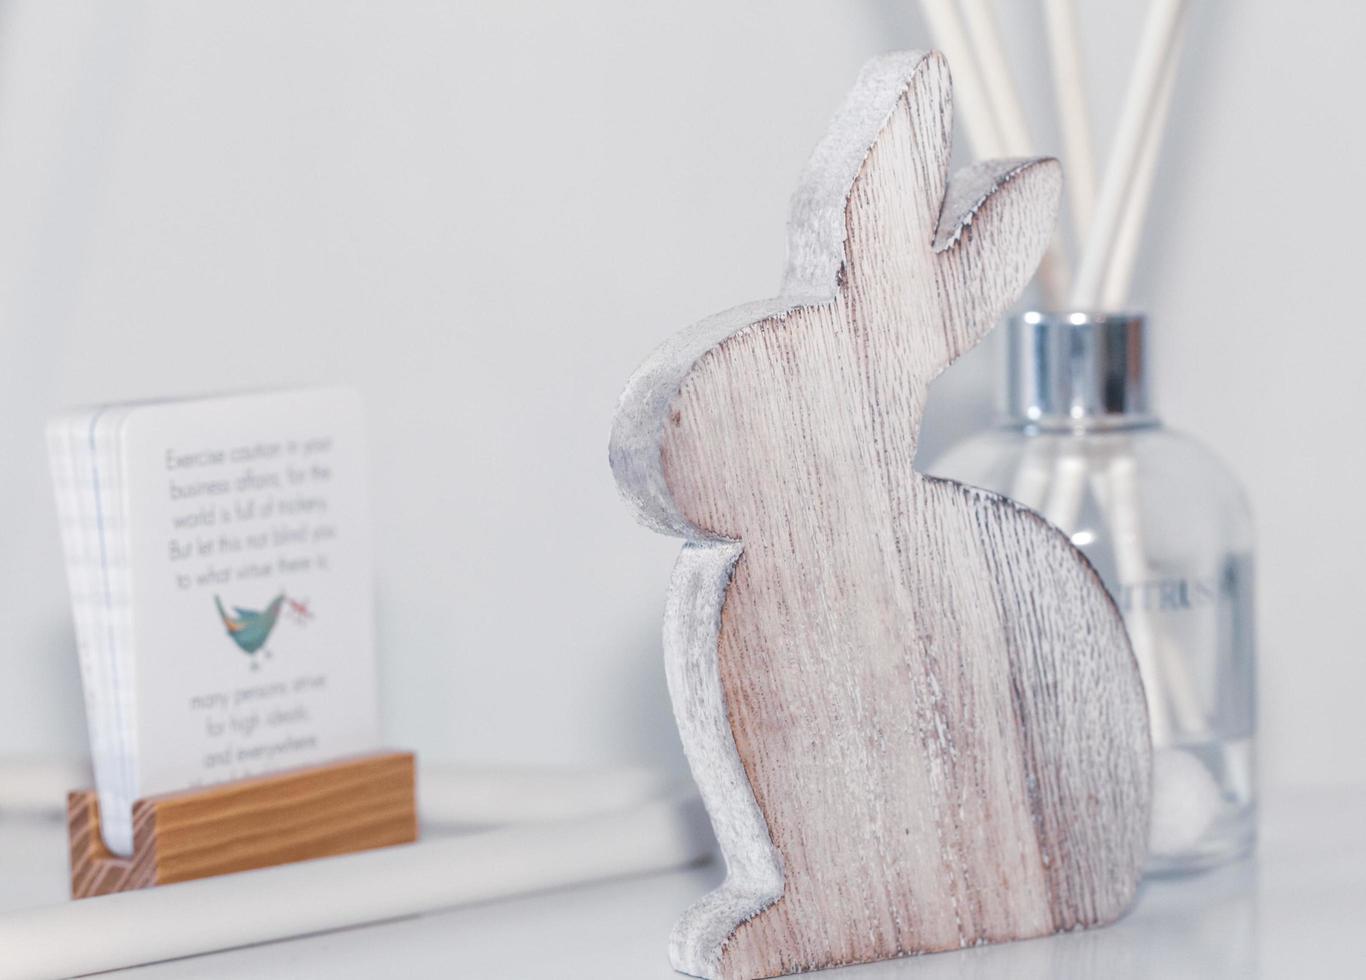 sydney, Australië, 2020 - houten konijn met tafeldecor foto